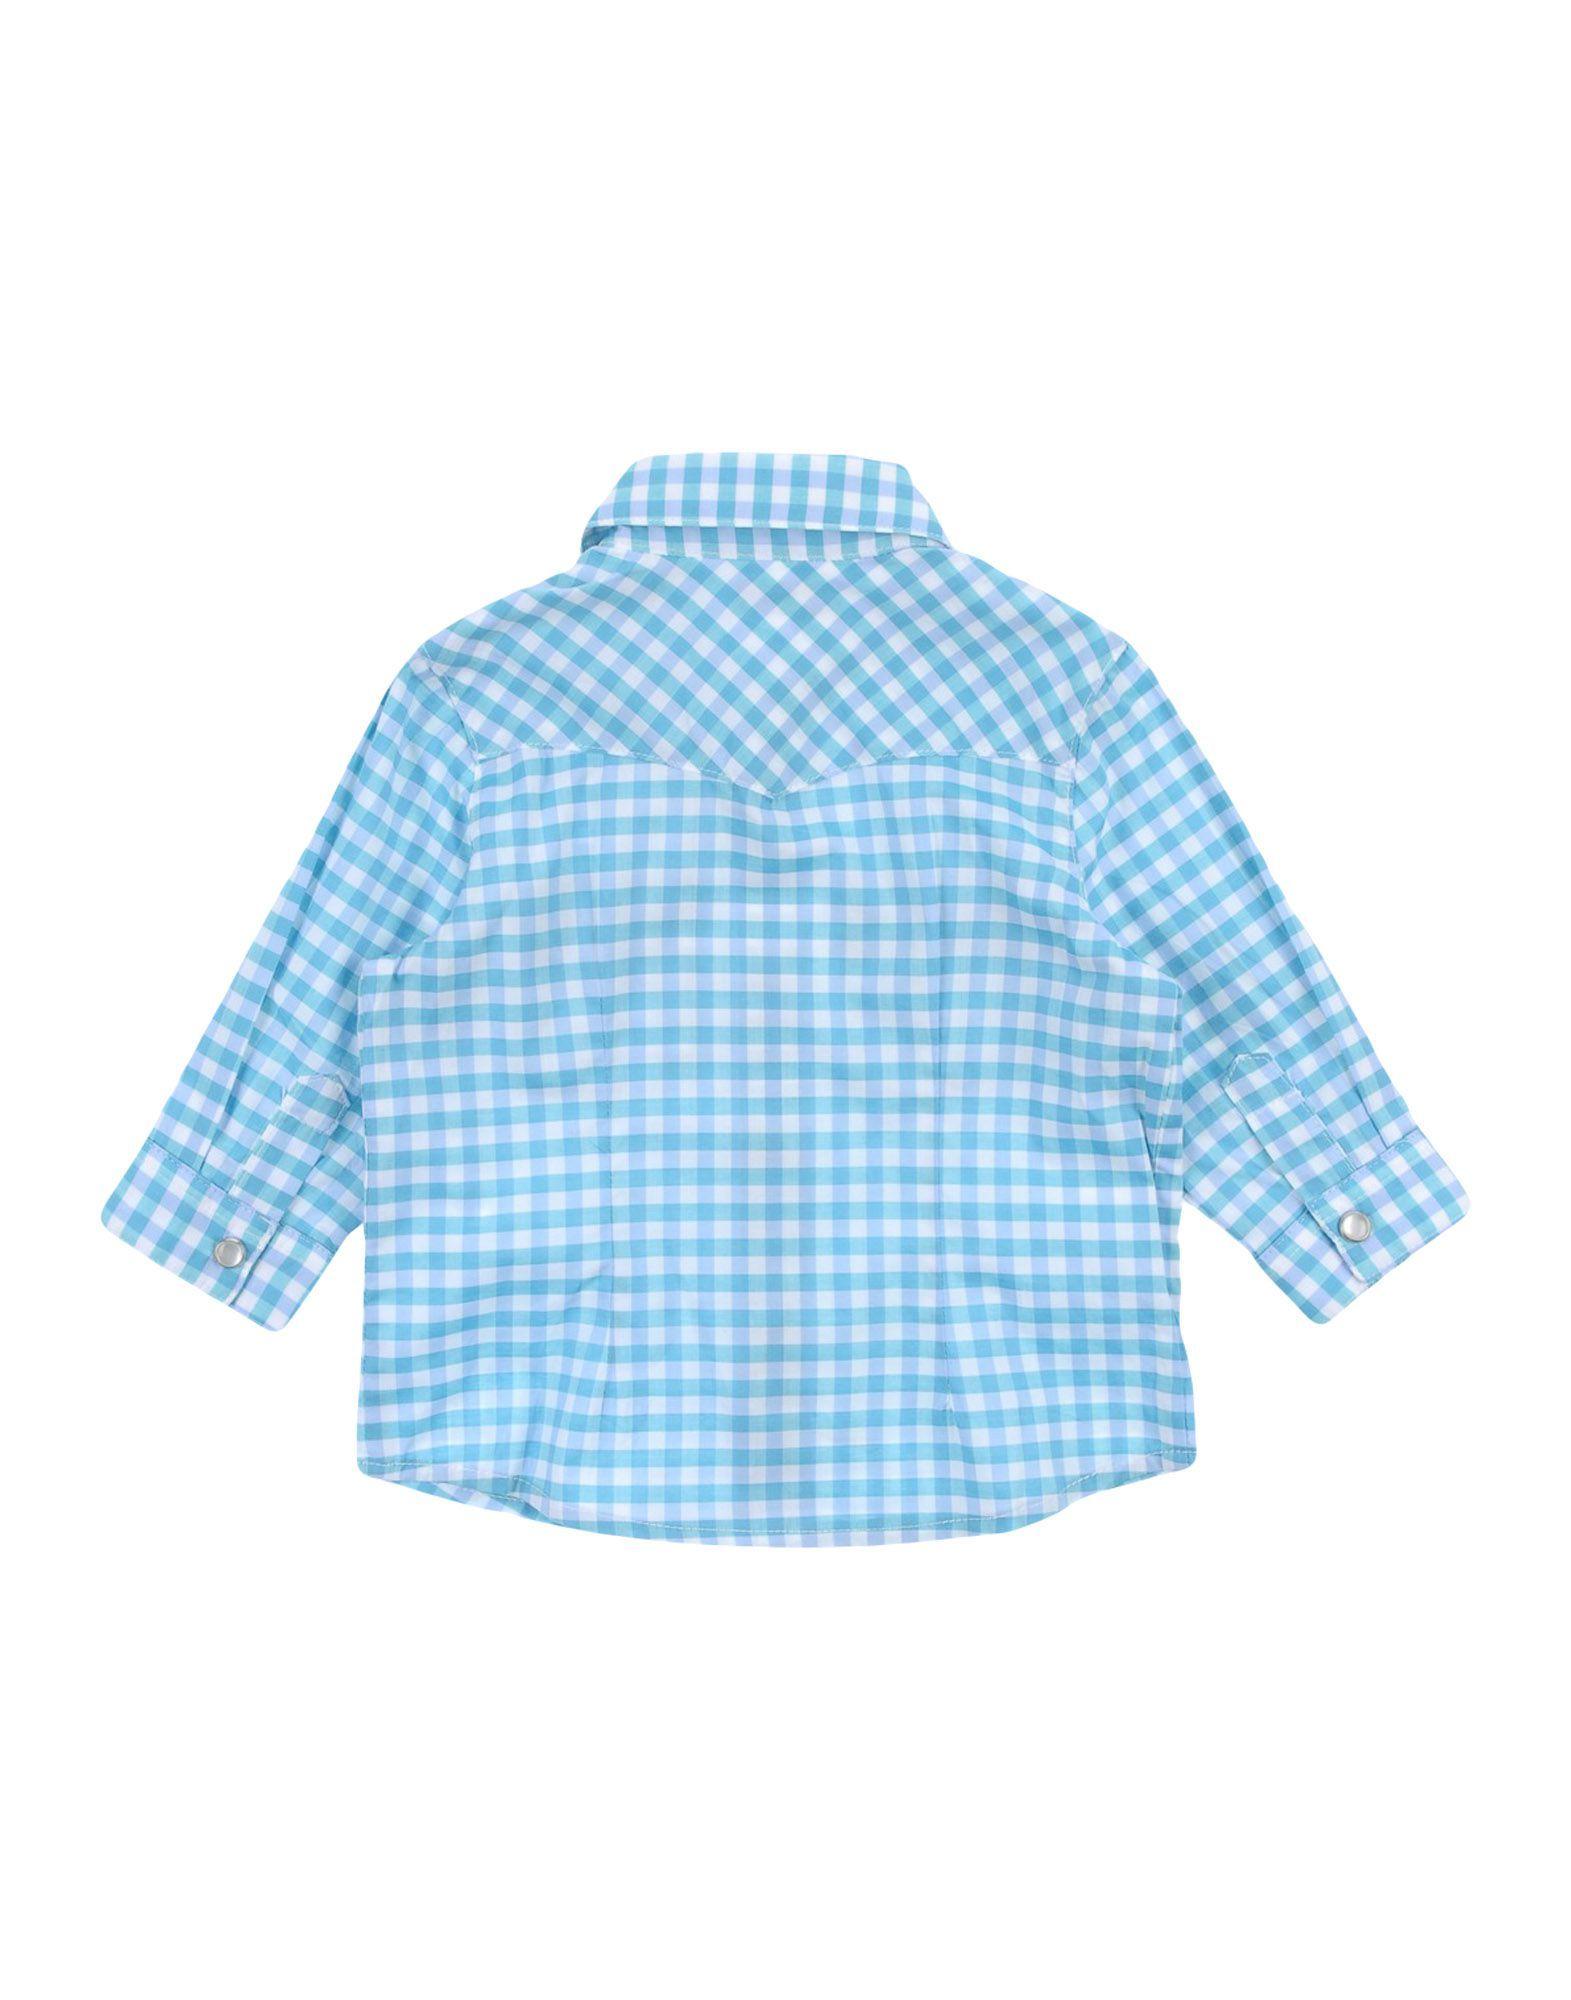 SHIRTS Grant Gar�on Baby Turquoise Boy Cotton